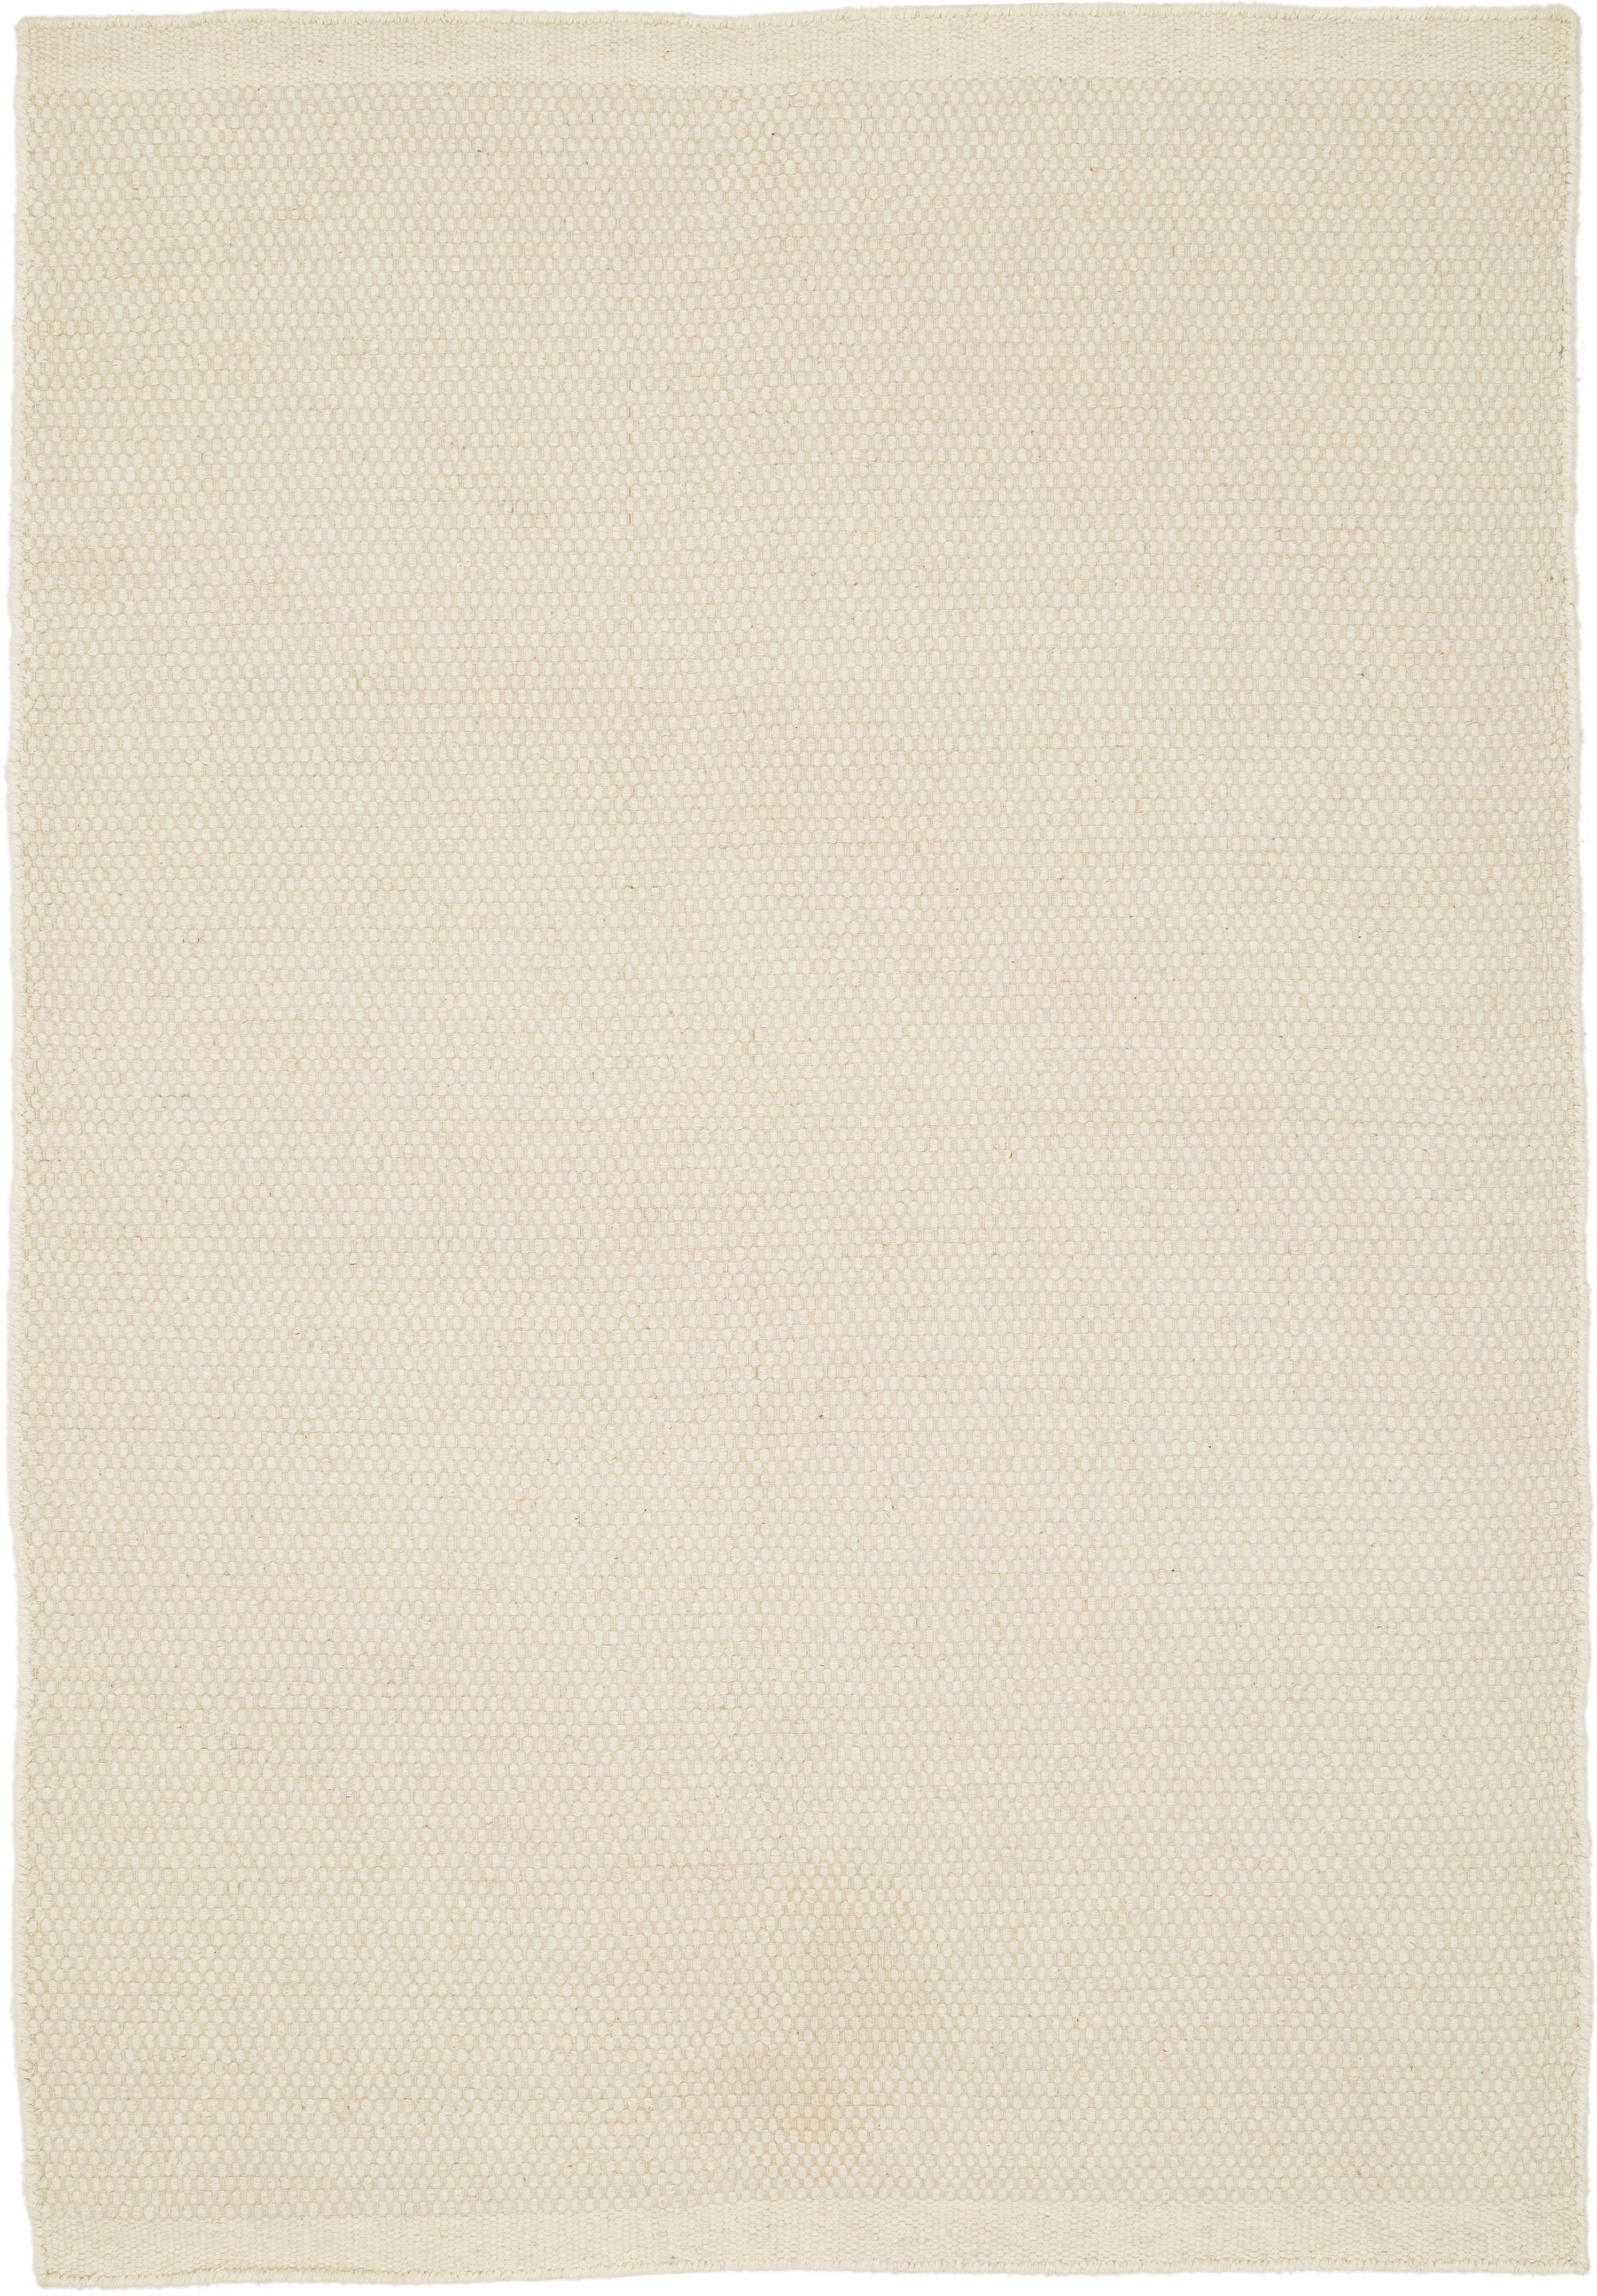 Alfombra artesanal de lana Delight, Parte superior: 90%lana, 10%algodón, Reverso: algodón, Blanco, An 250 x L 350 cm